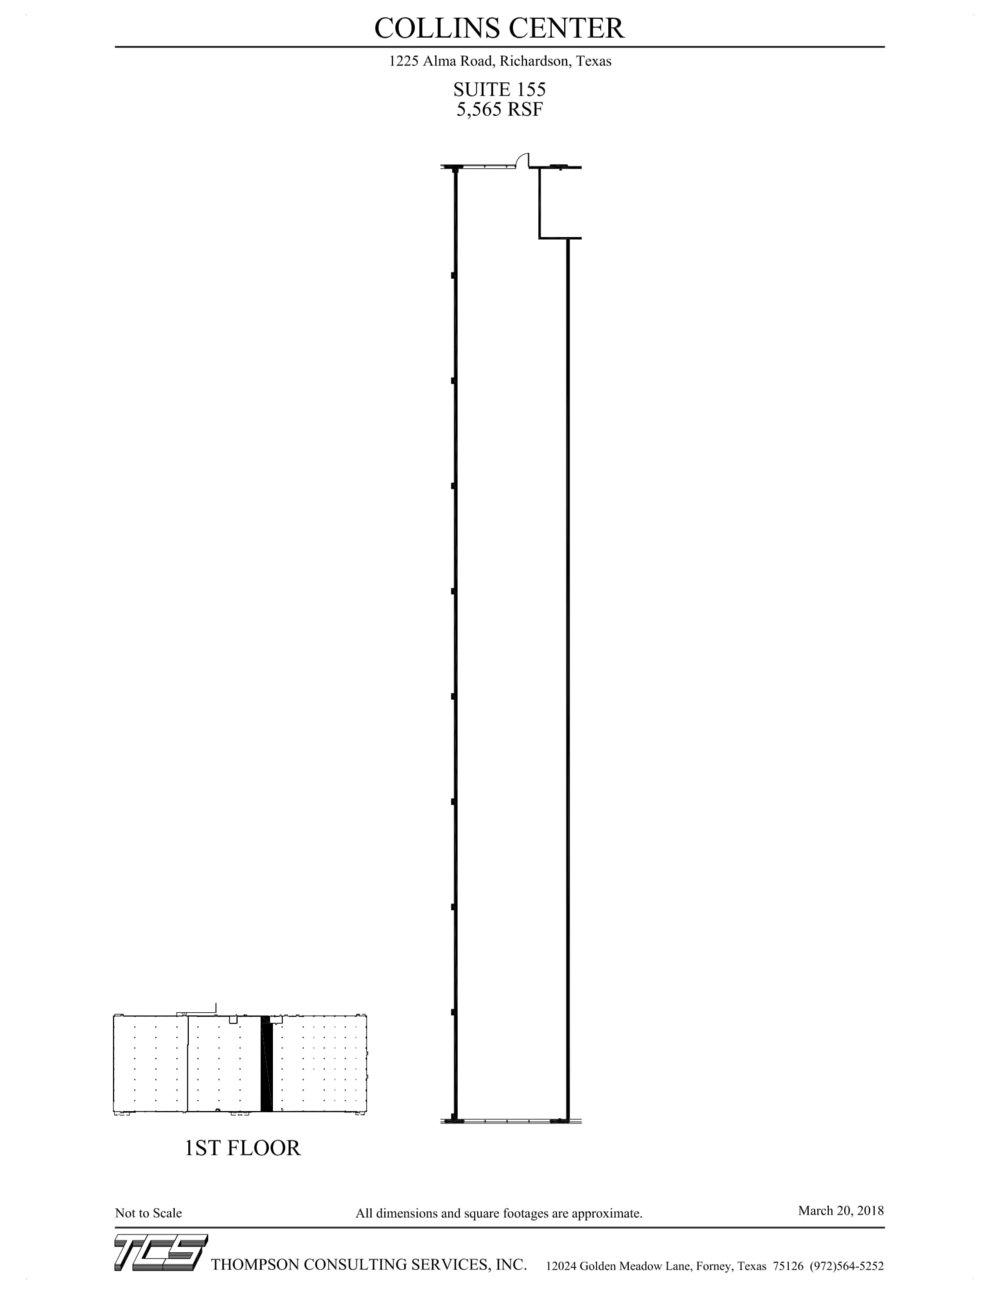 1225 Alma - Suite 155 - Marketing Plan-1